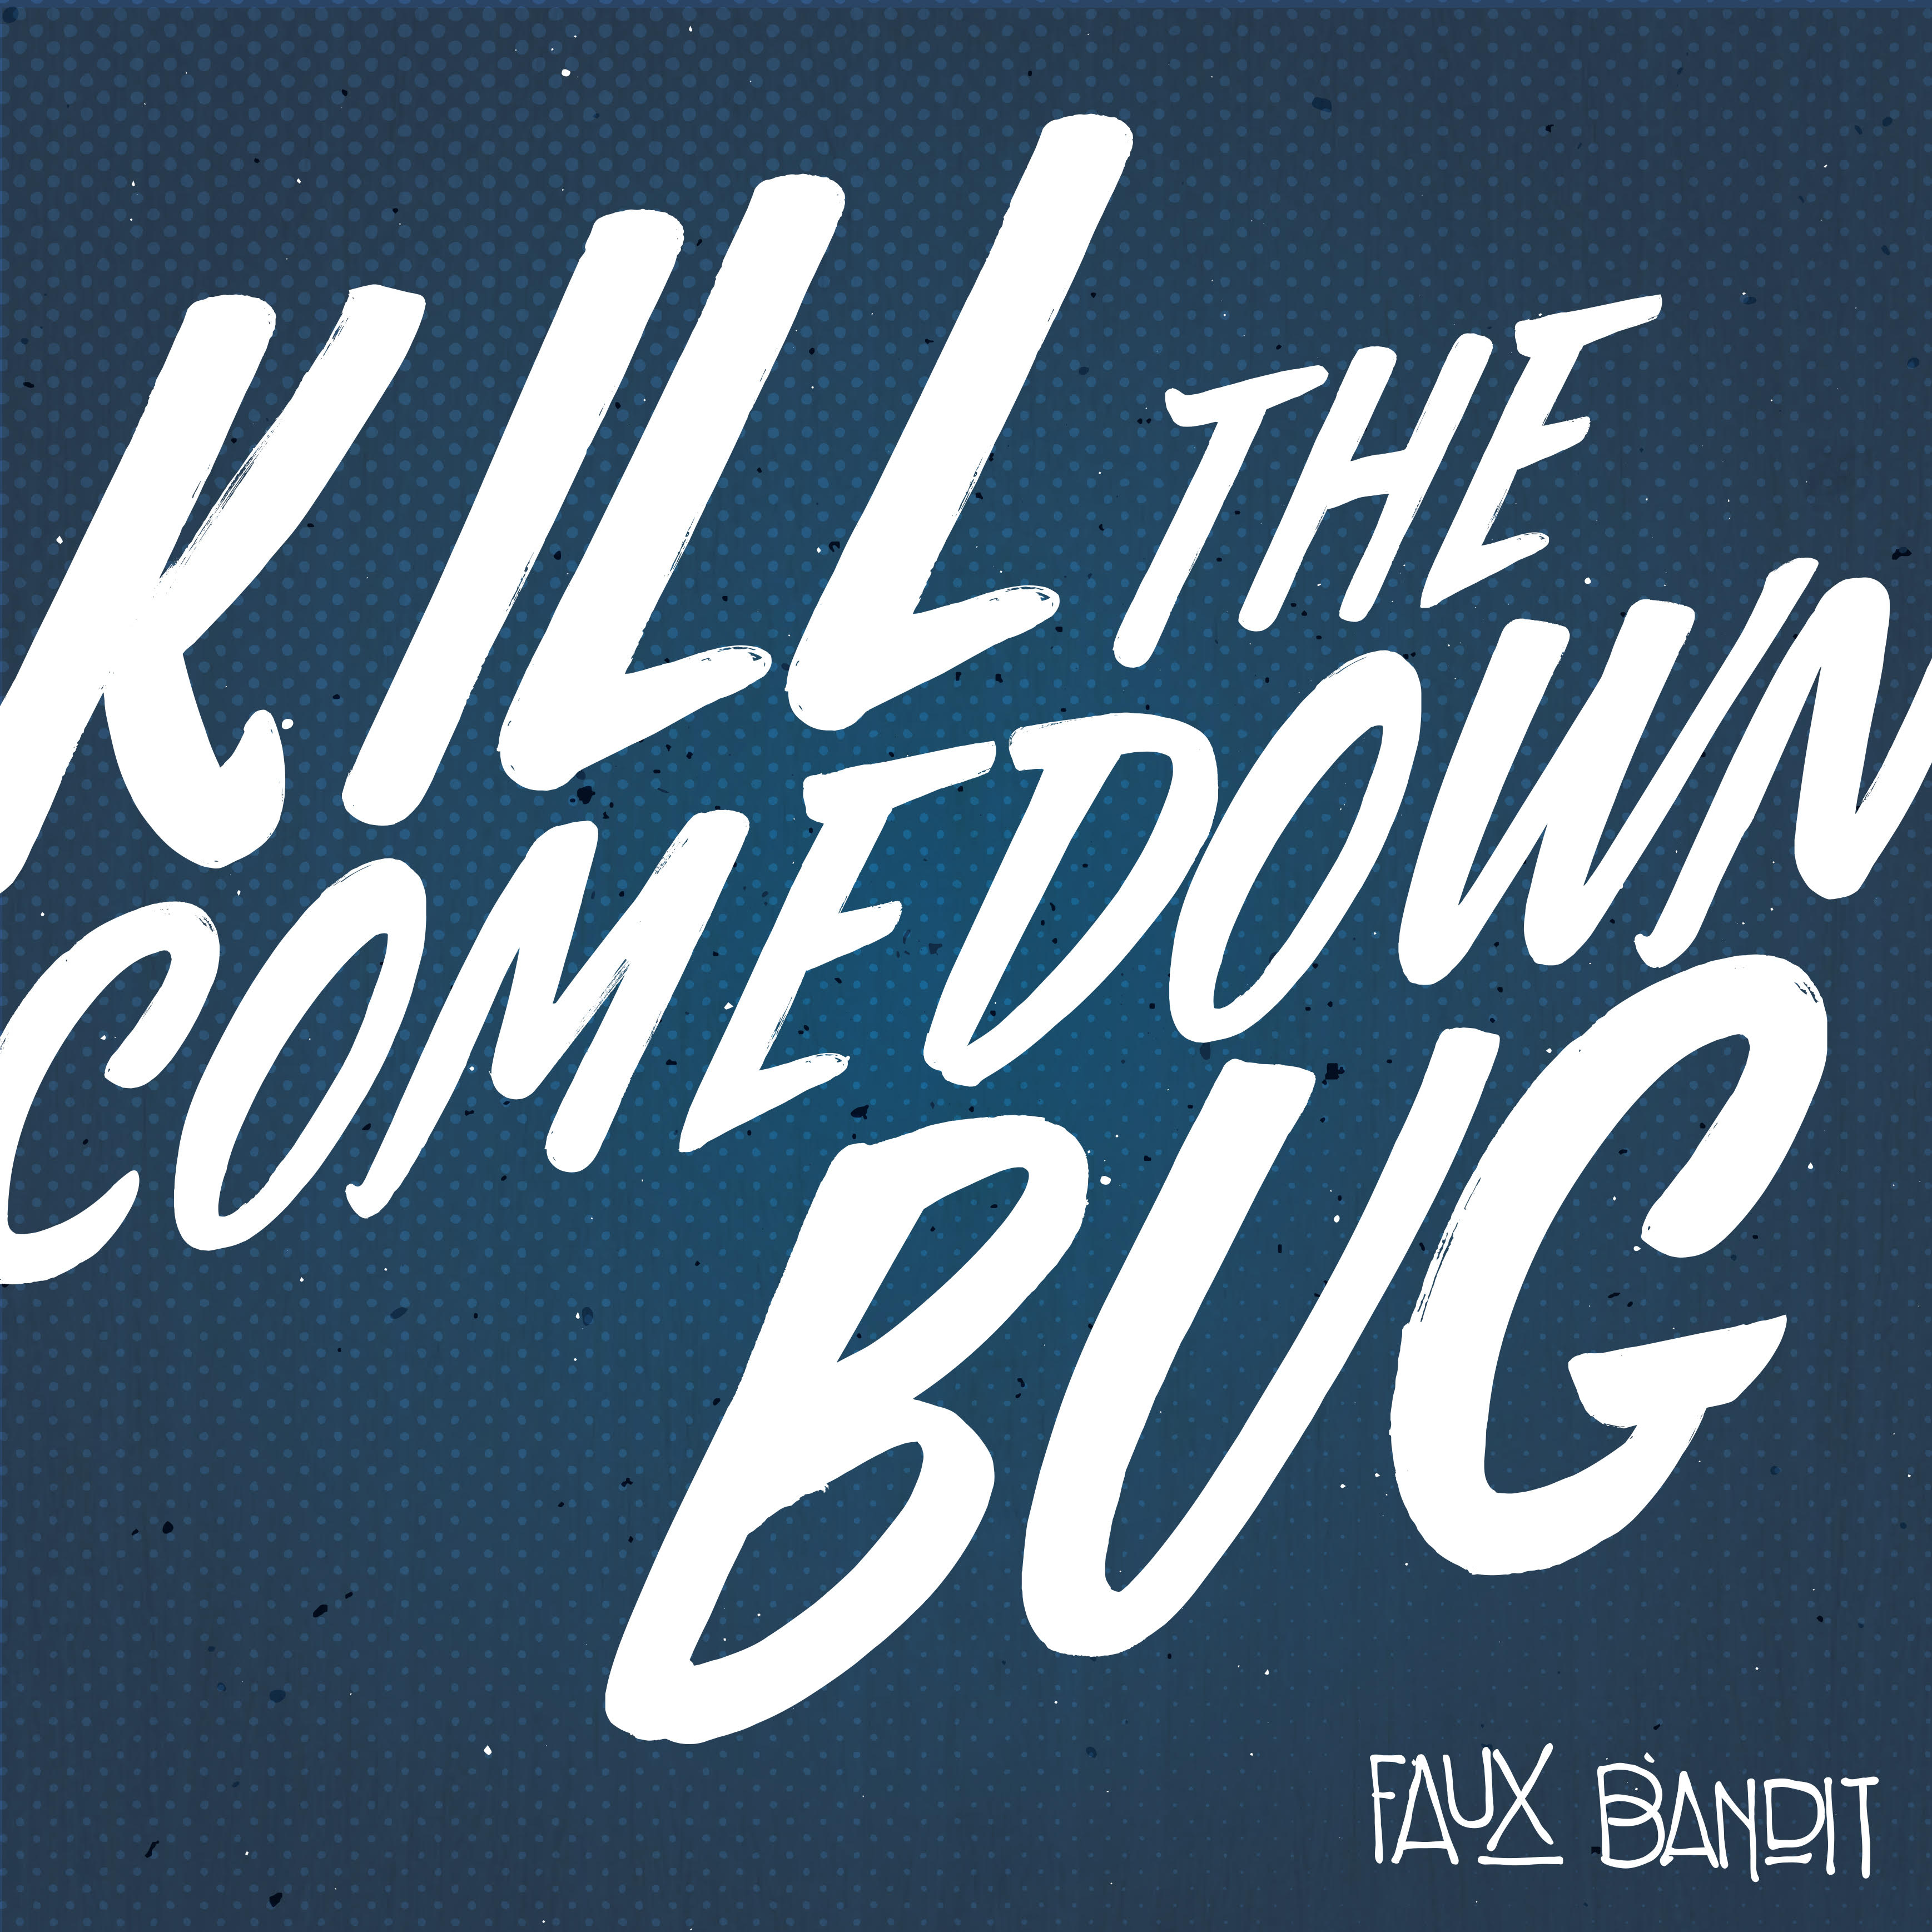 Faux Bandit - Kill The Comedown Bug